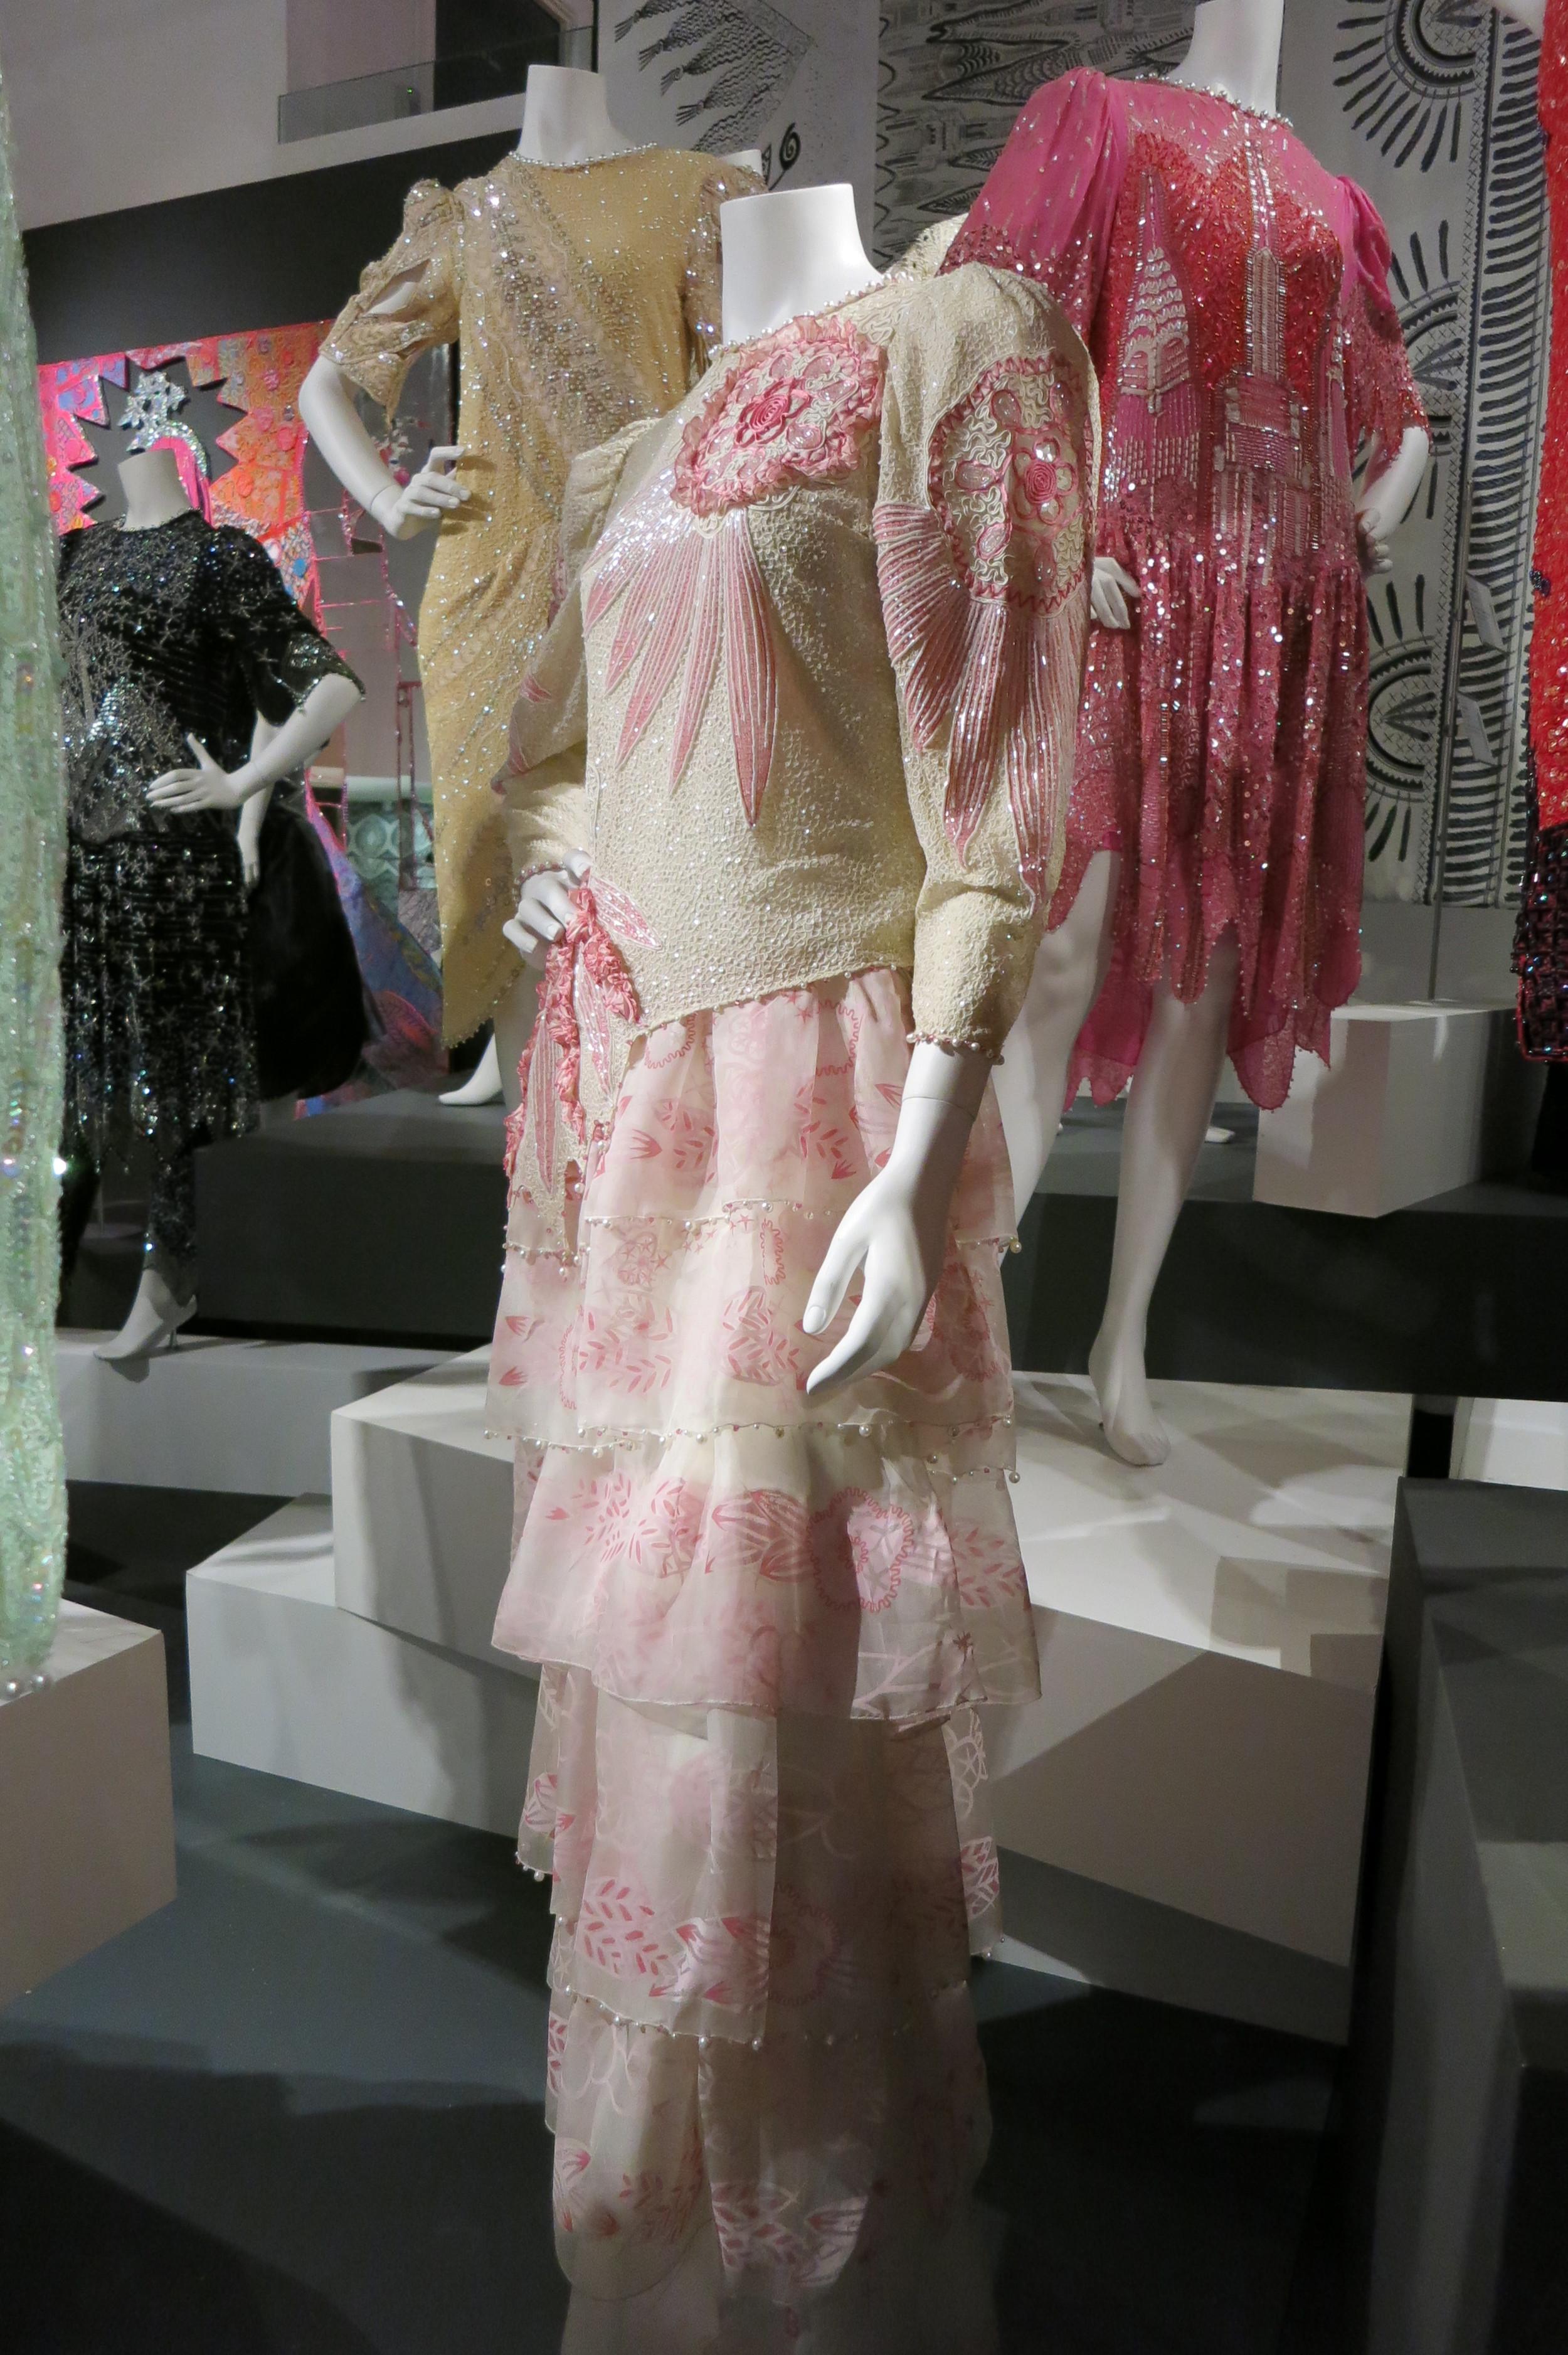 Zandra Rhodes exhibition at the Fashion & Textile Museum, Bermondsey, London 2013